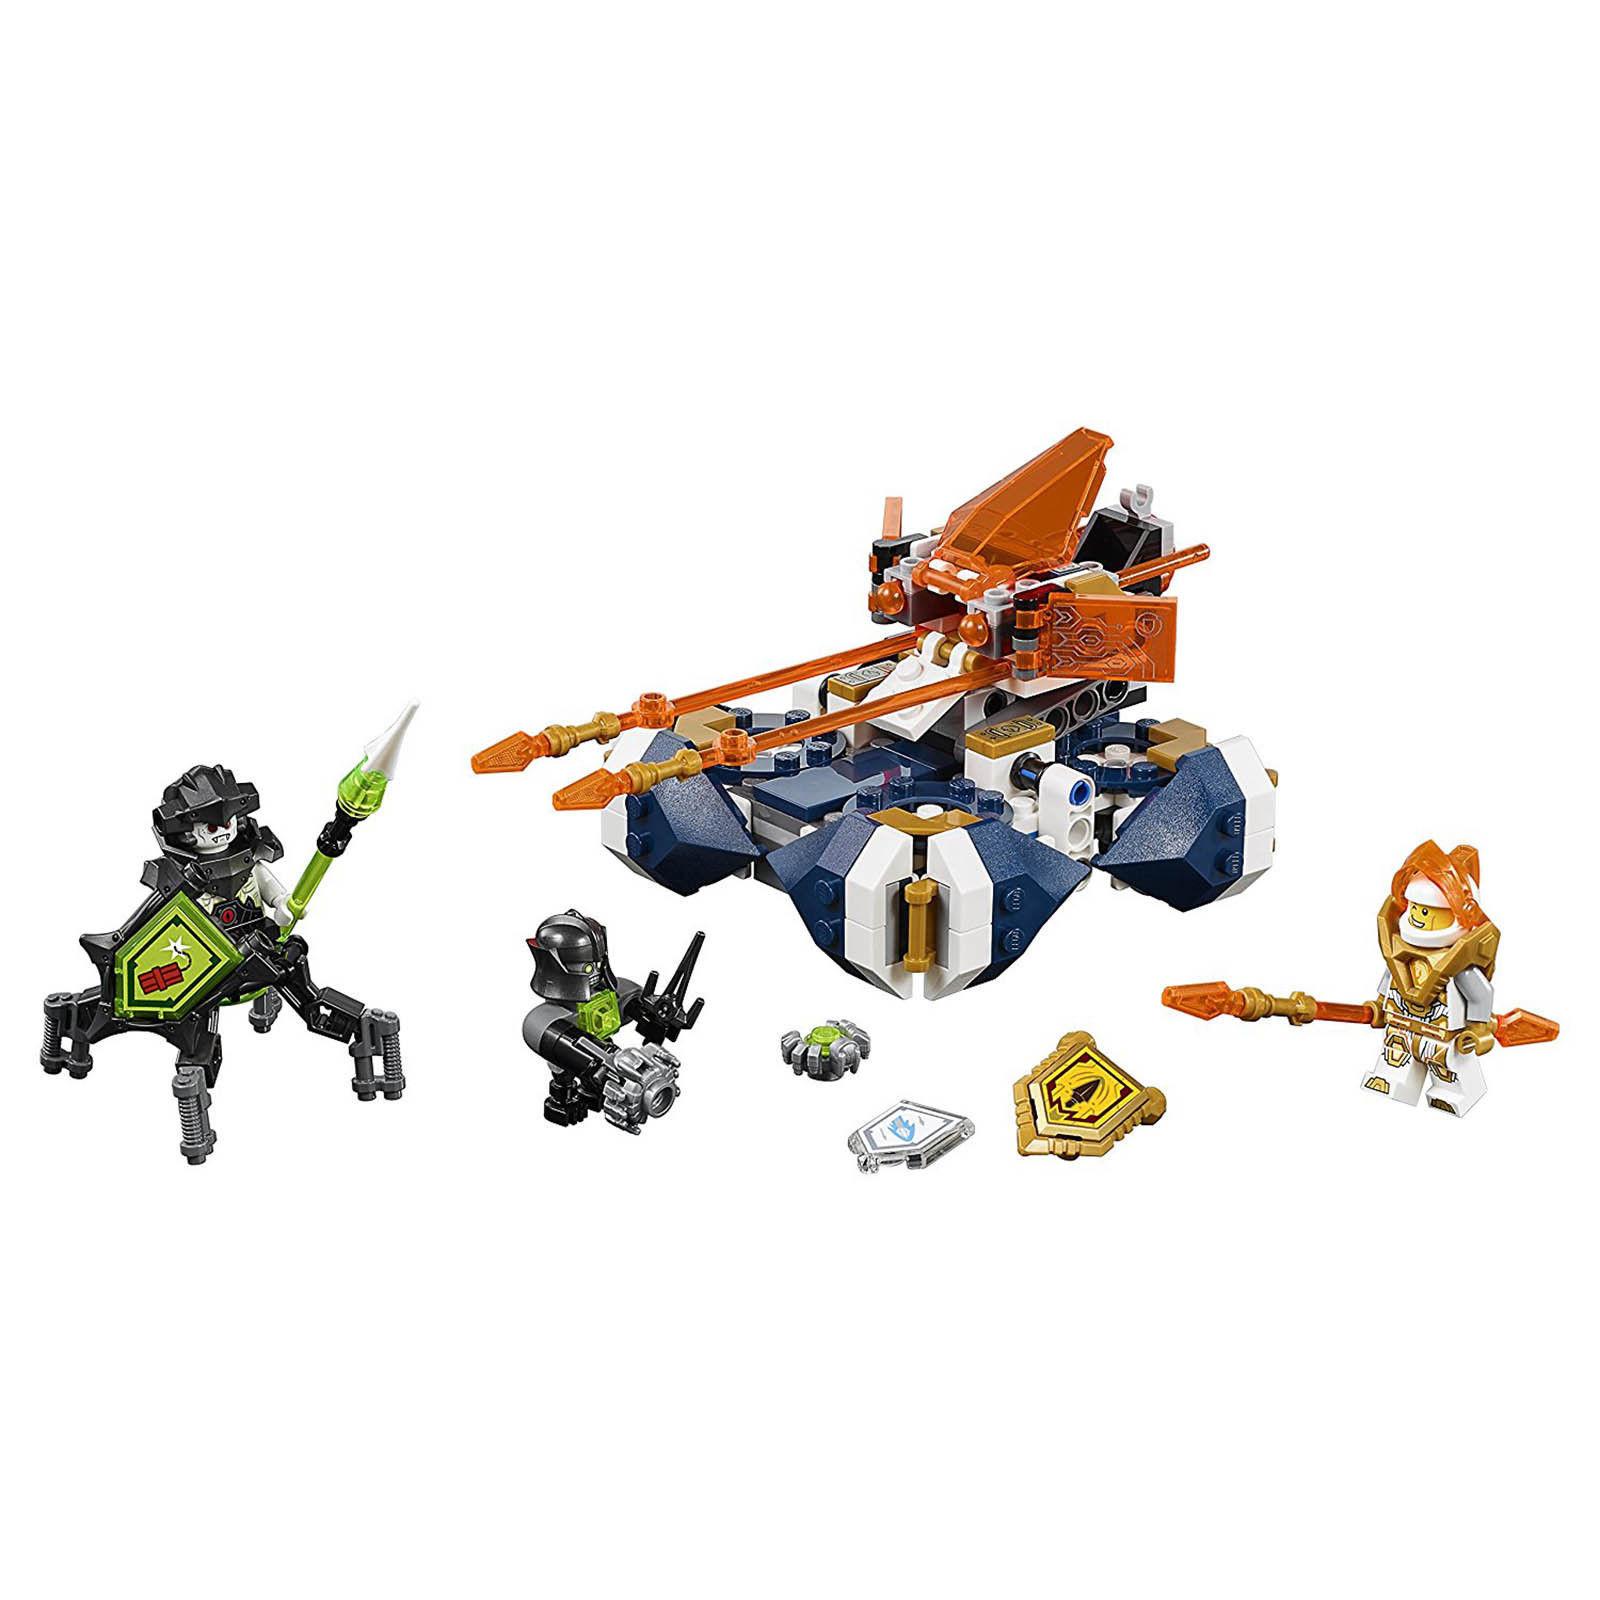 LEGO Nexo Knights Lances Hover Jouster Building Set 72001 217 Pcs [New]